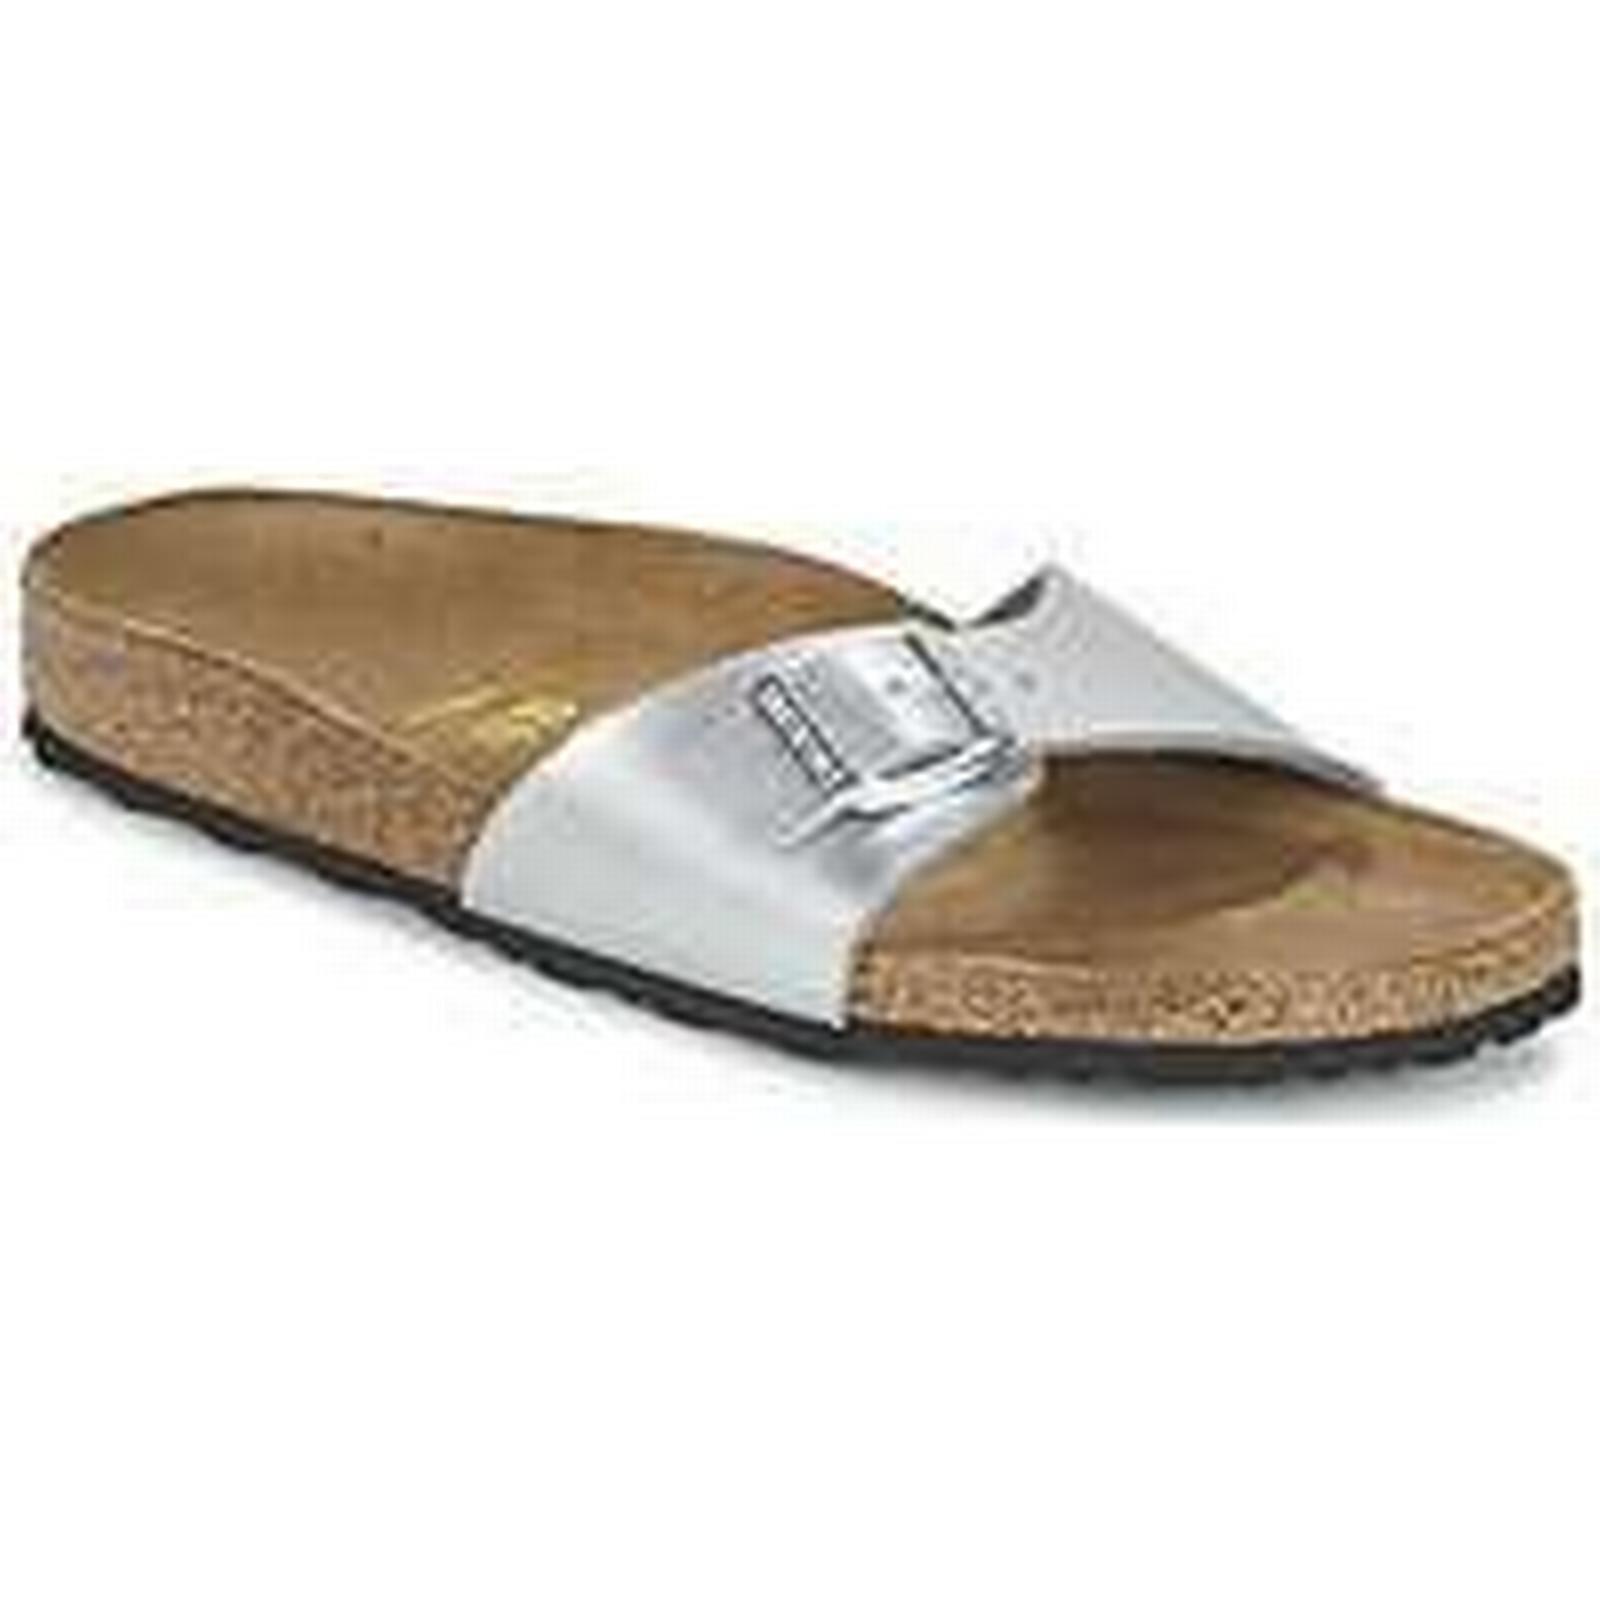 Spartoo.co.uk Birkenstock Casual MADRID women's Mules / Casual Birkenstock Shoes in Silver 8bd159